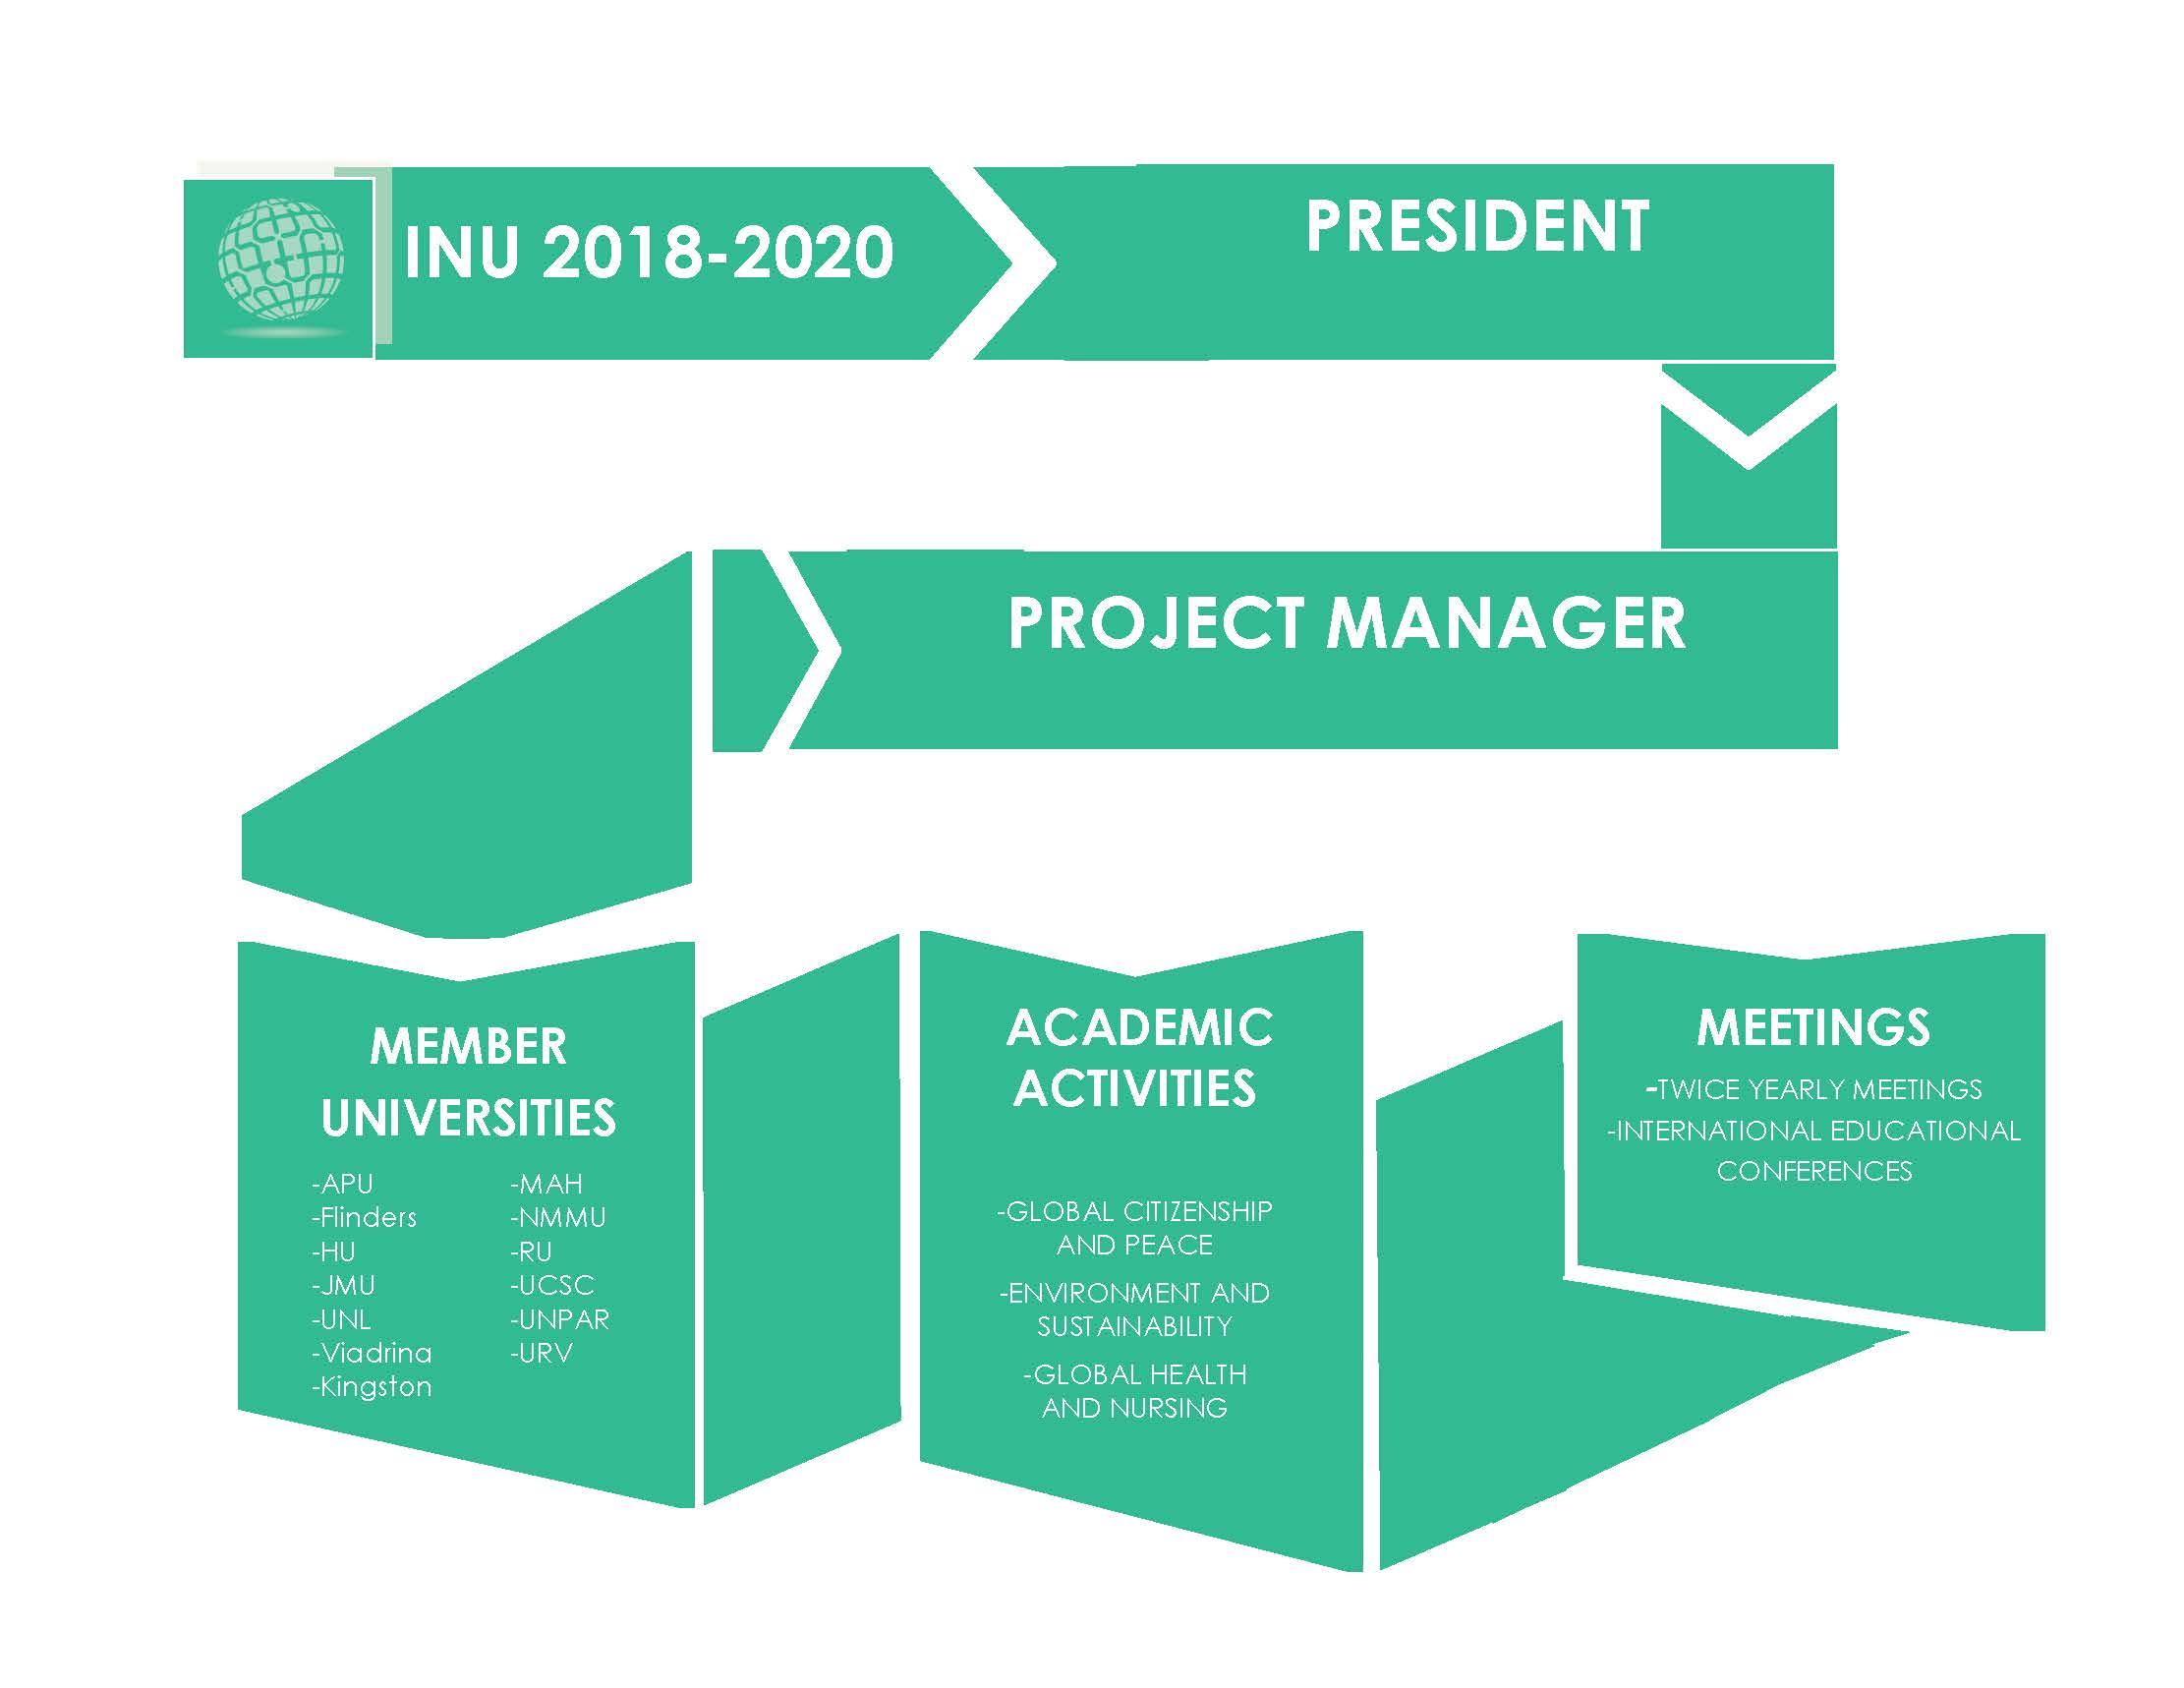 INU organisation chart